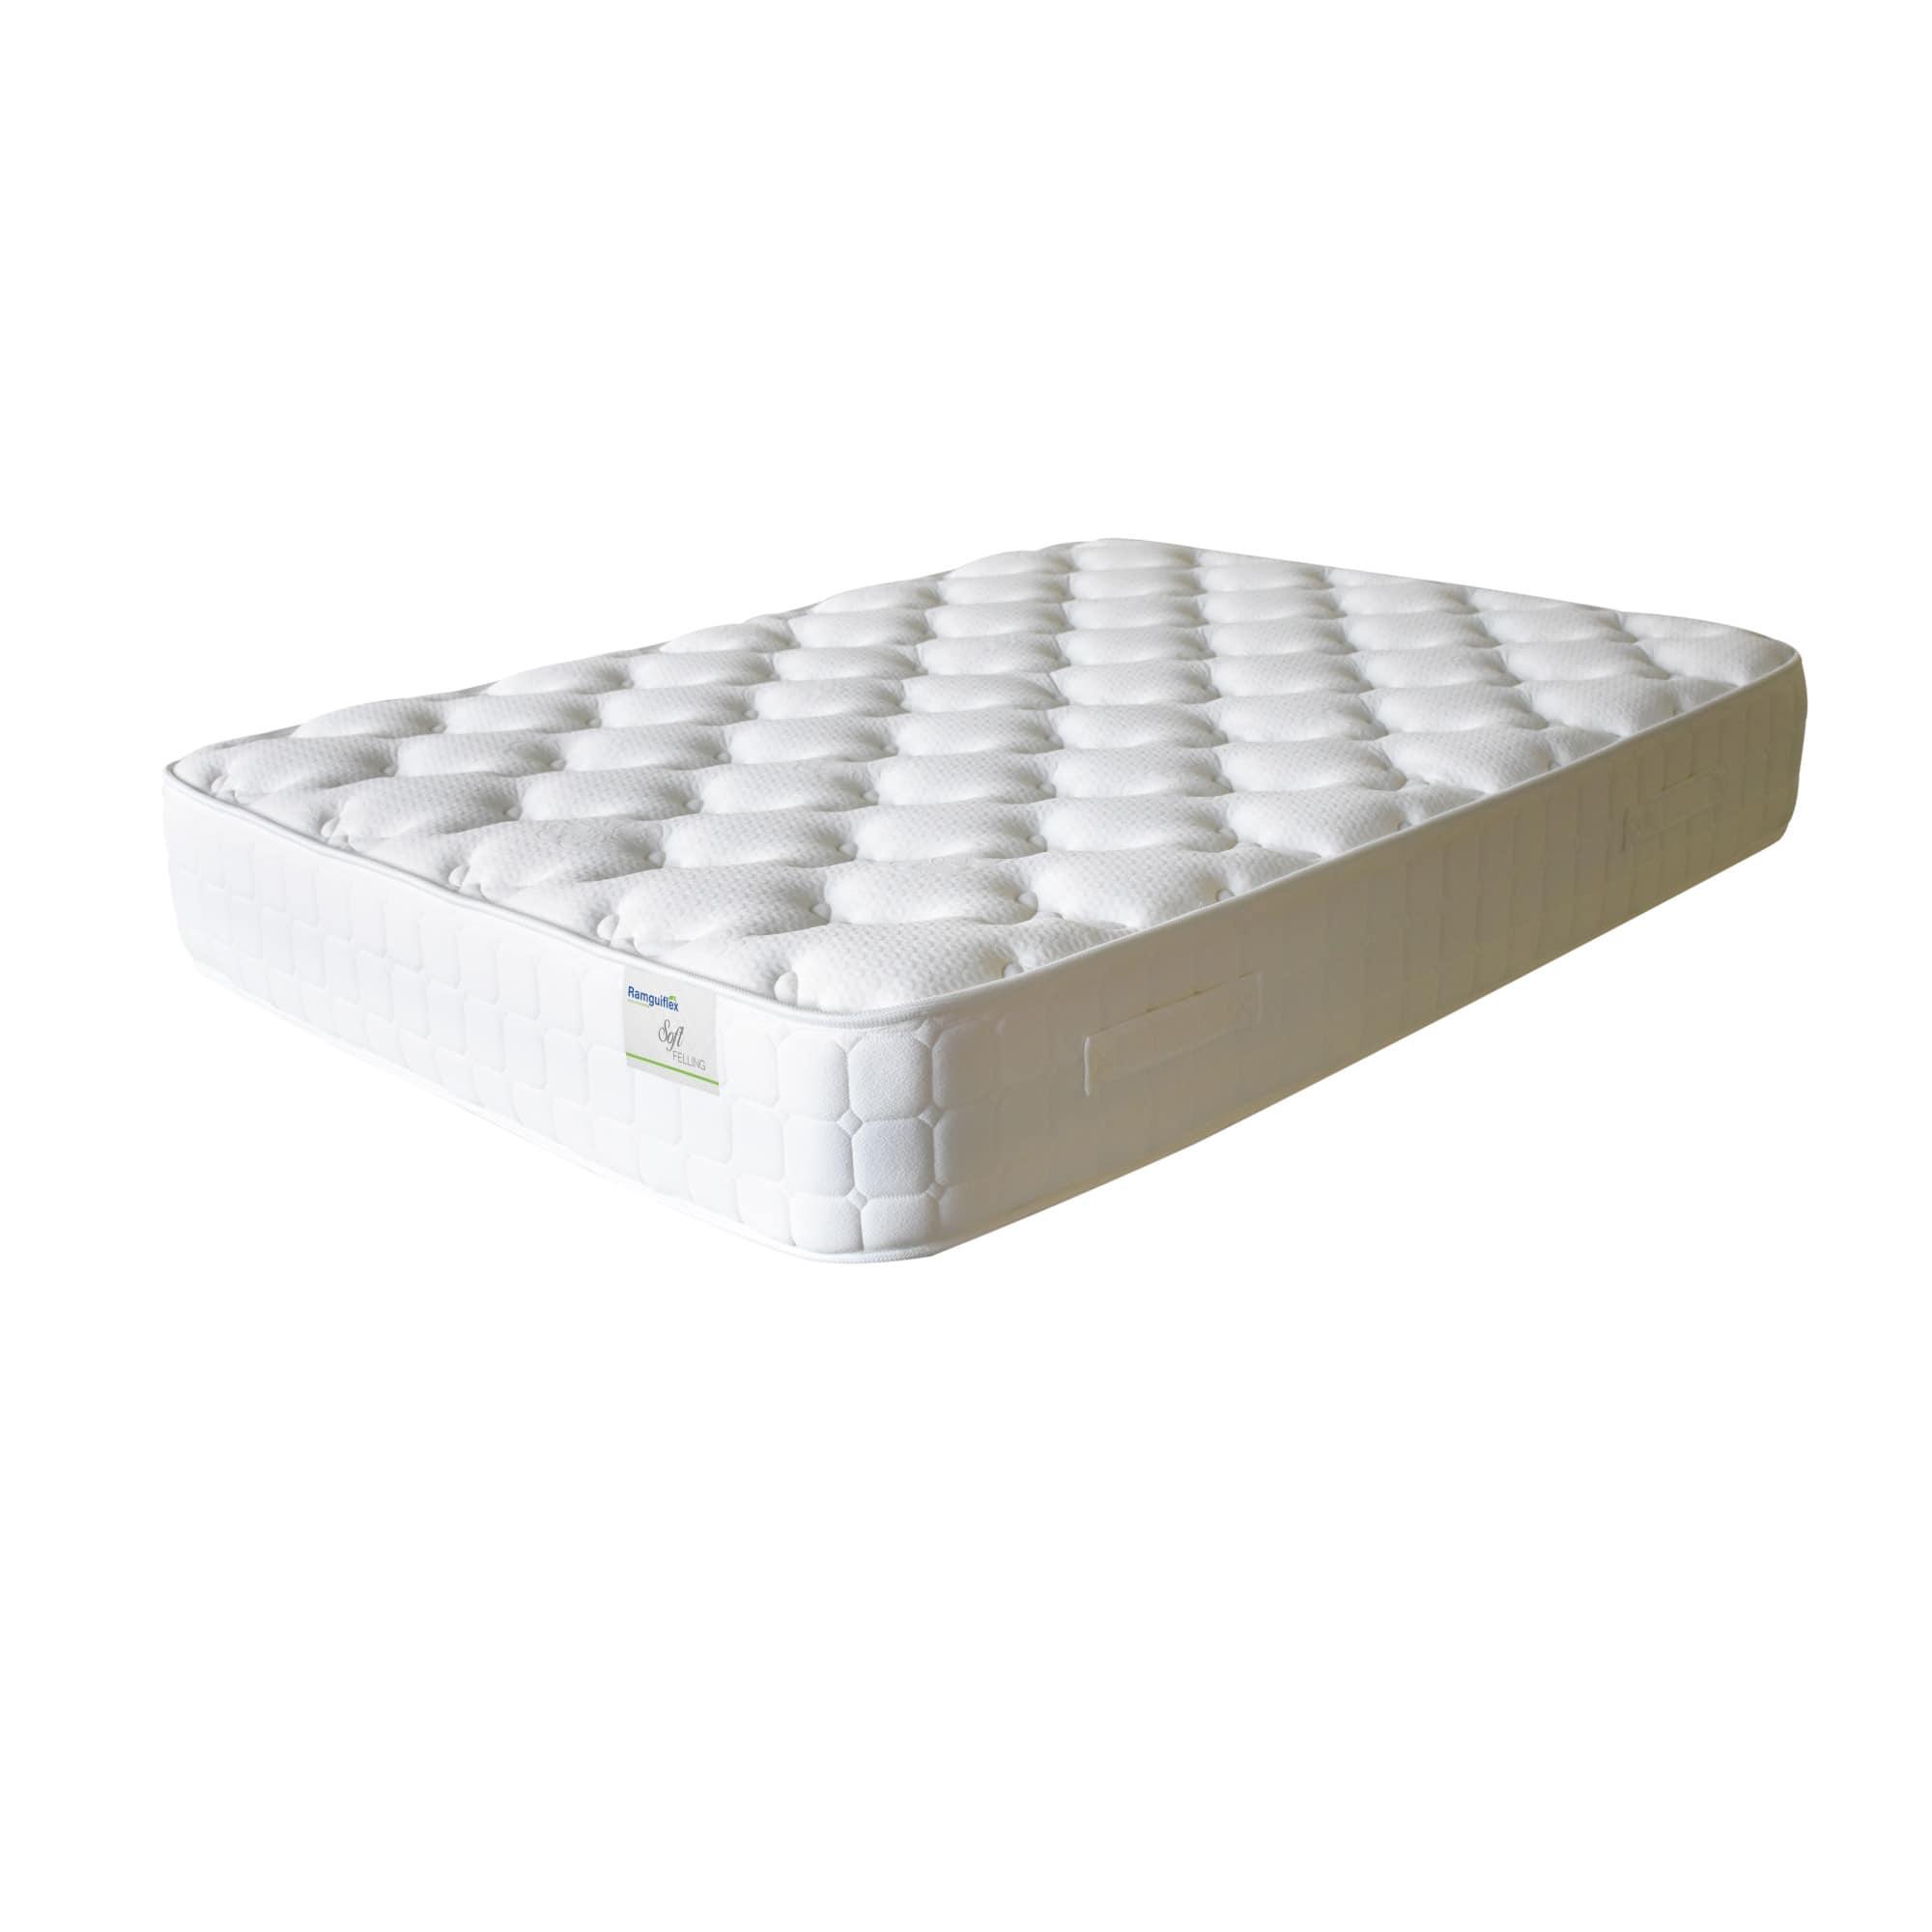 cama sencilla-cama semidoble-cama king-cama nido